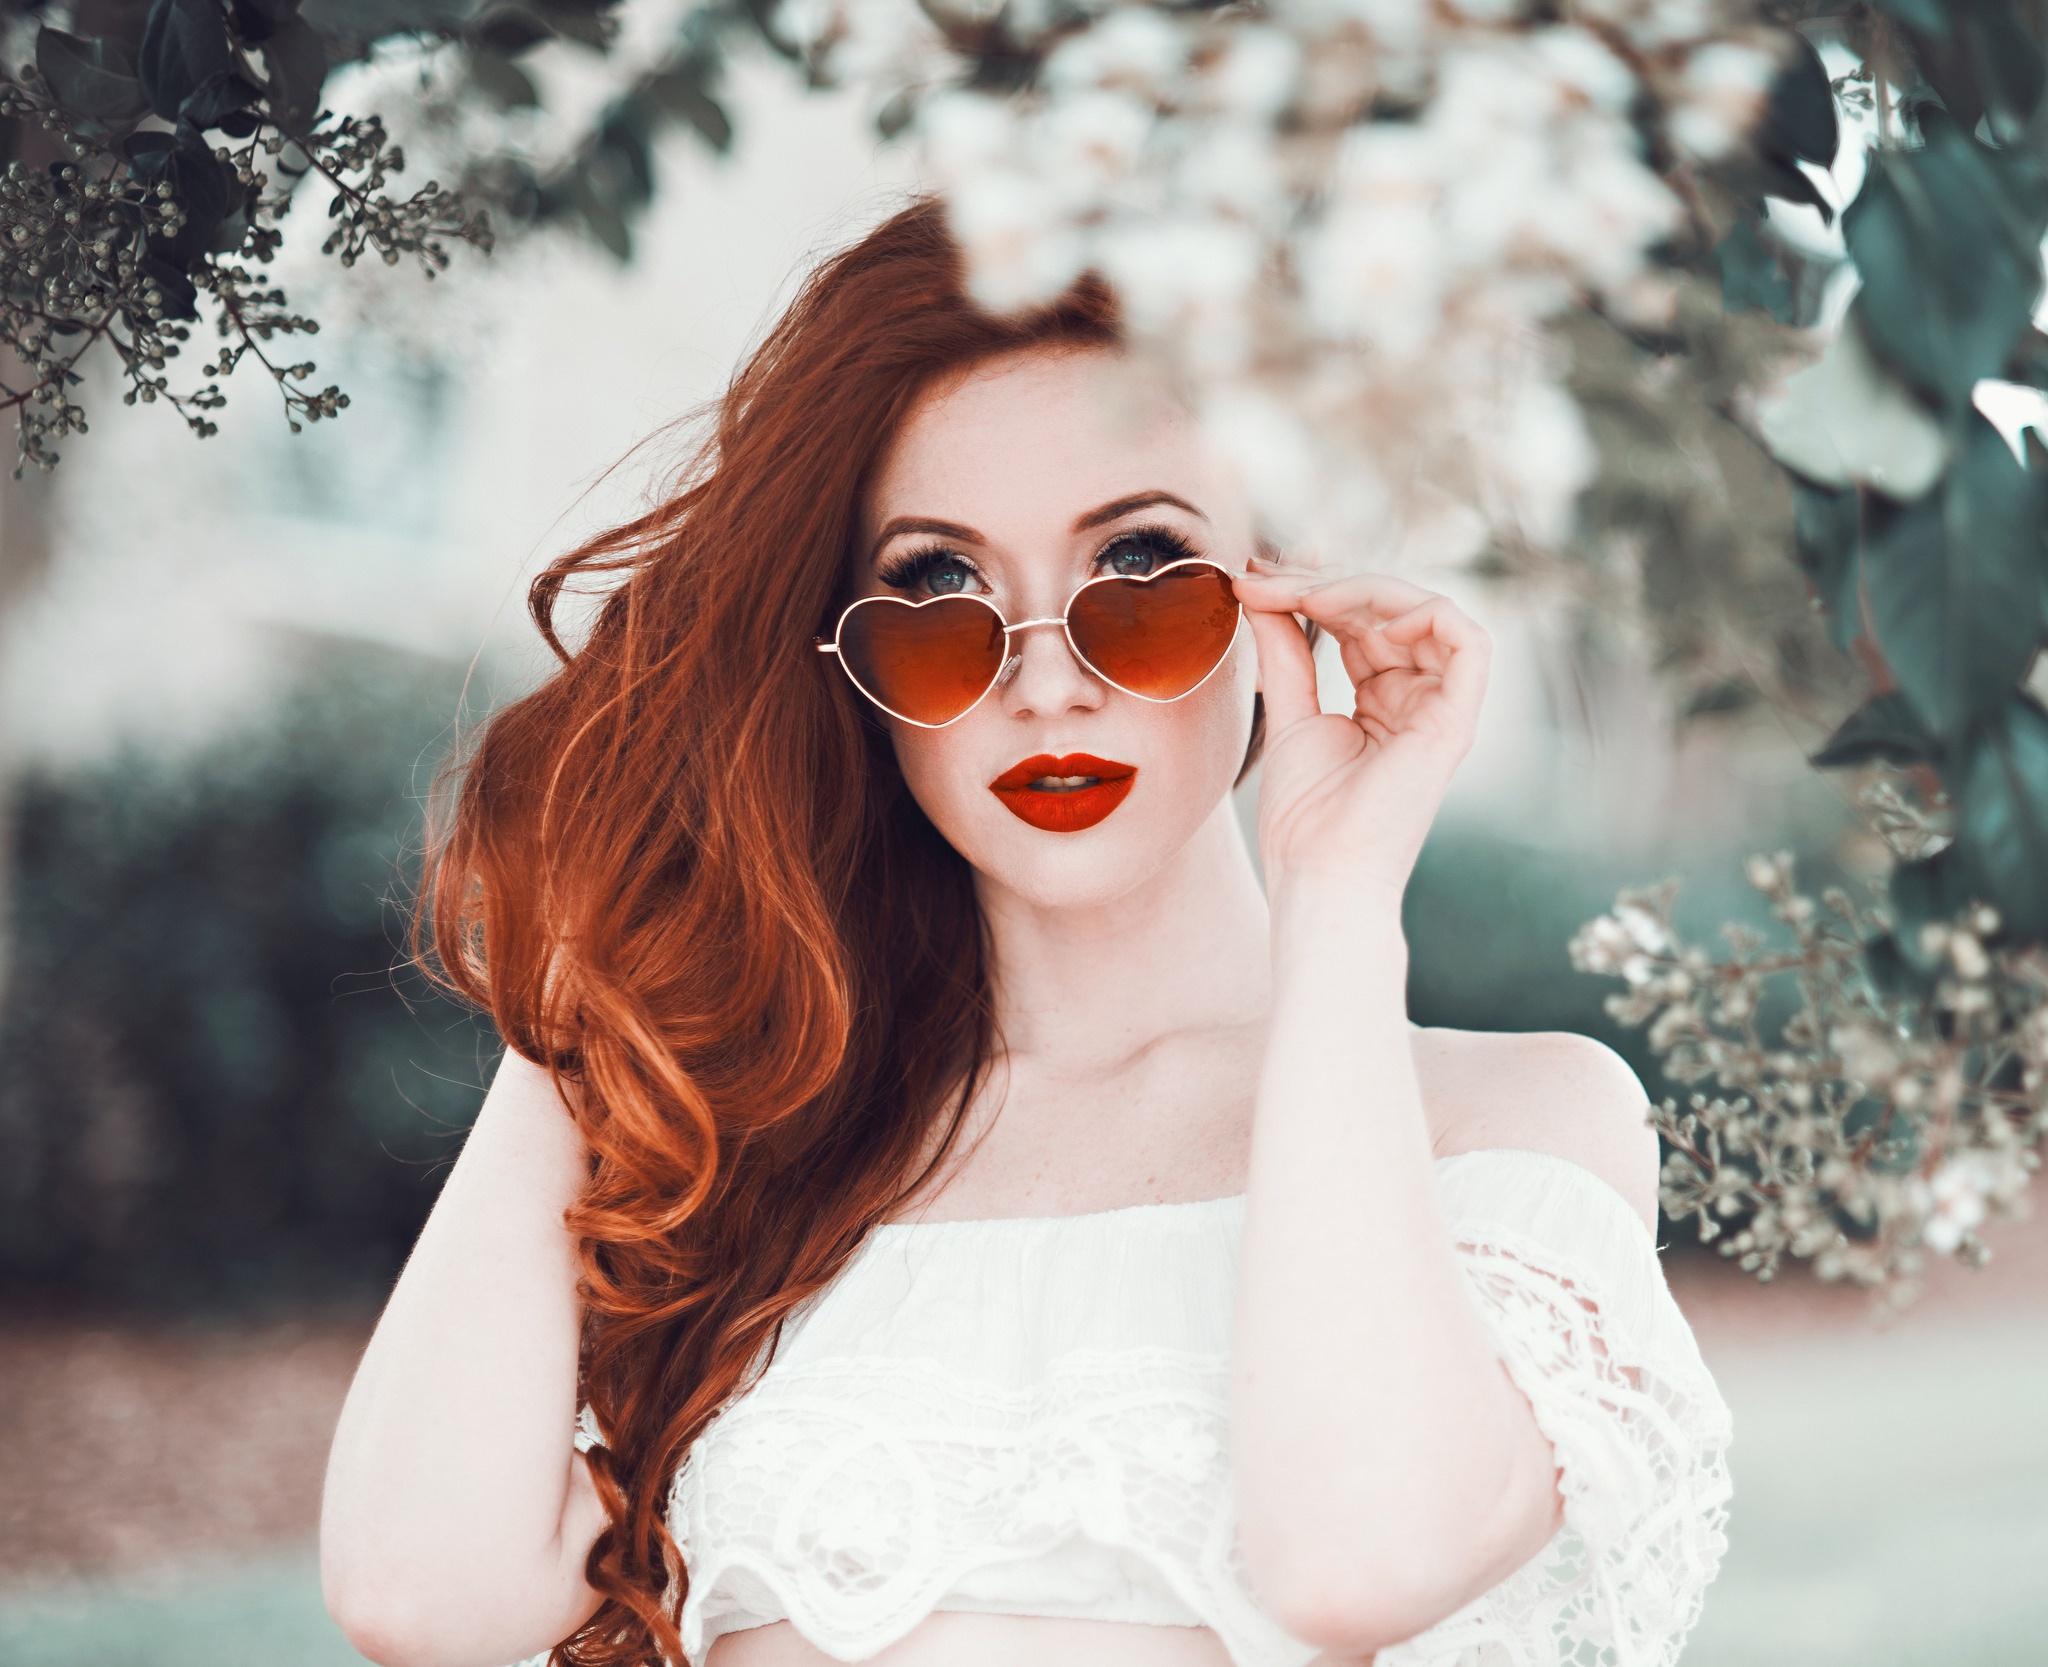 Women redhead glasses girls going the